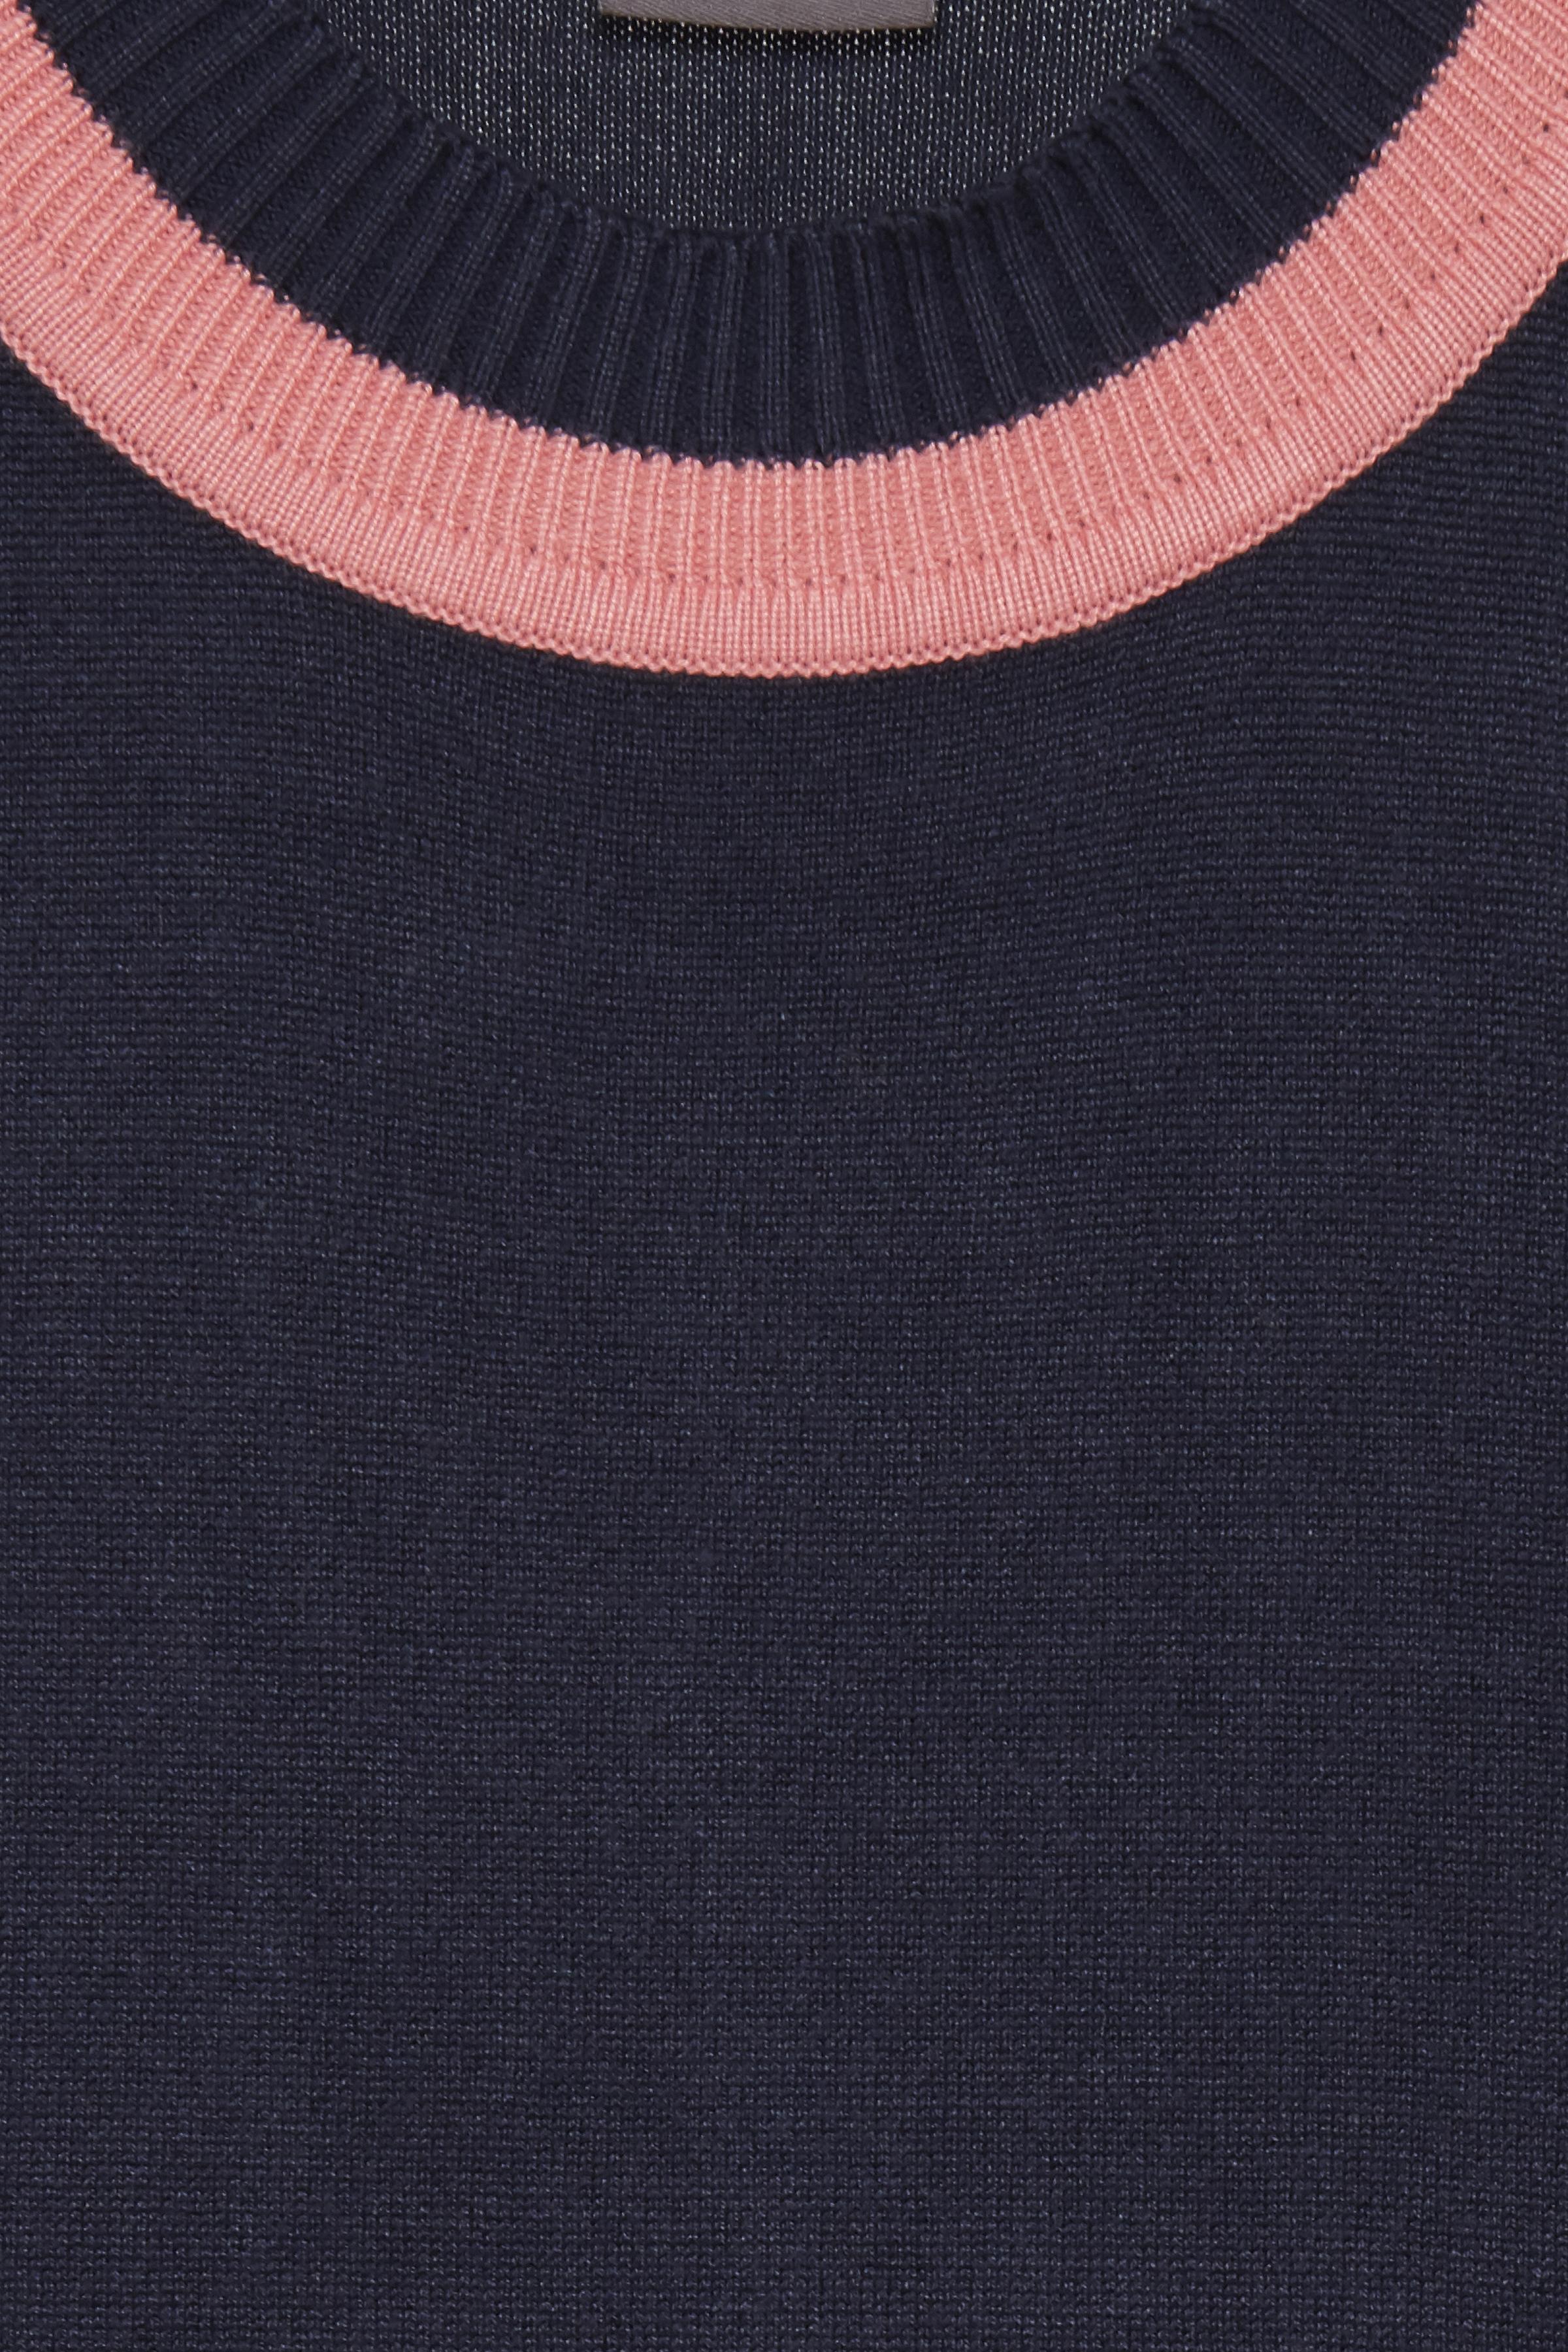 Total Eclipse Knitted pullover fra Ichi – Køb Total Eclipse Knitted pullover fra str. XS-XL her